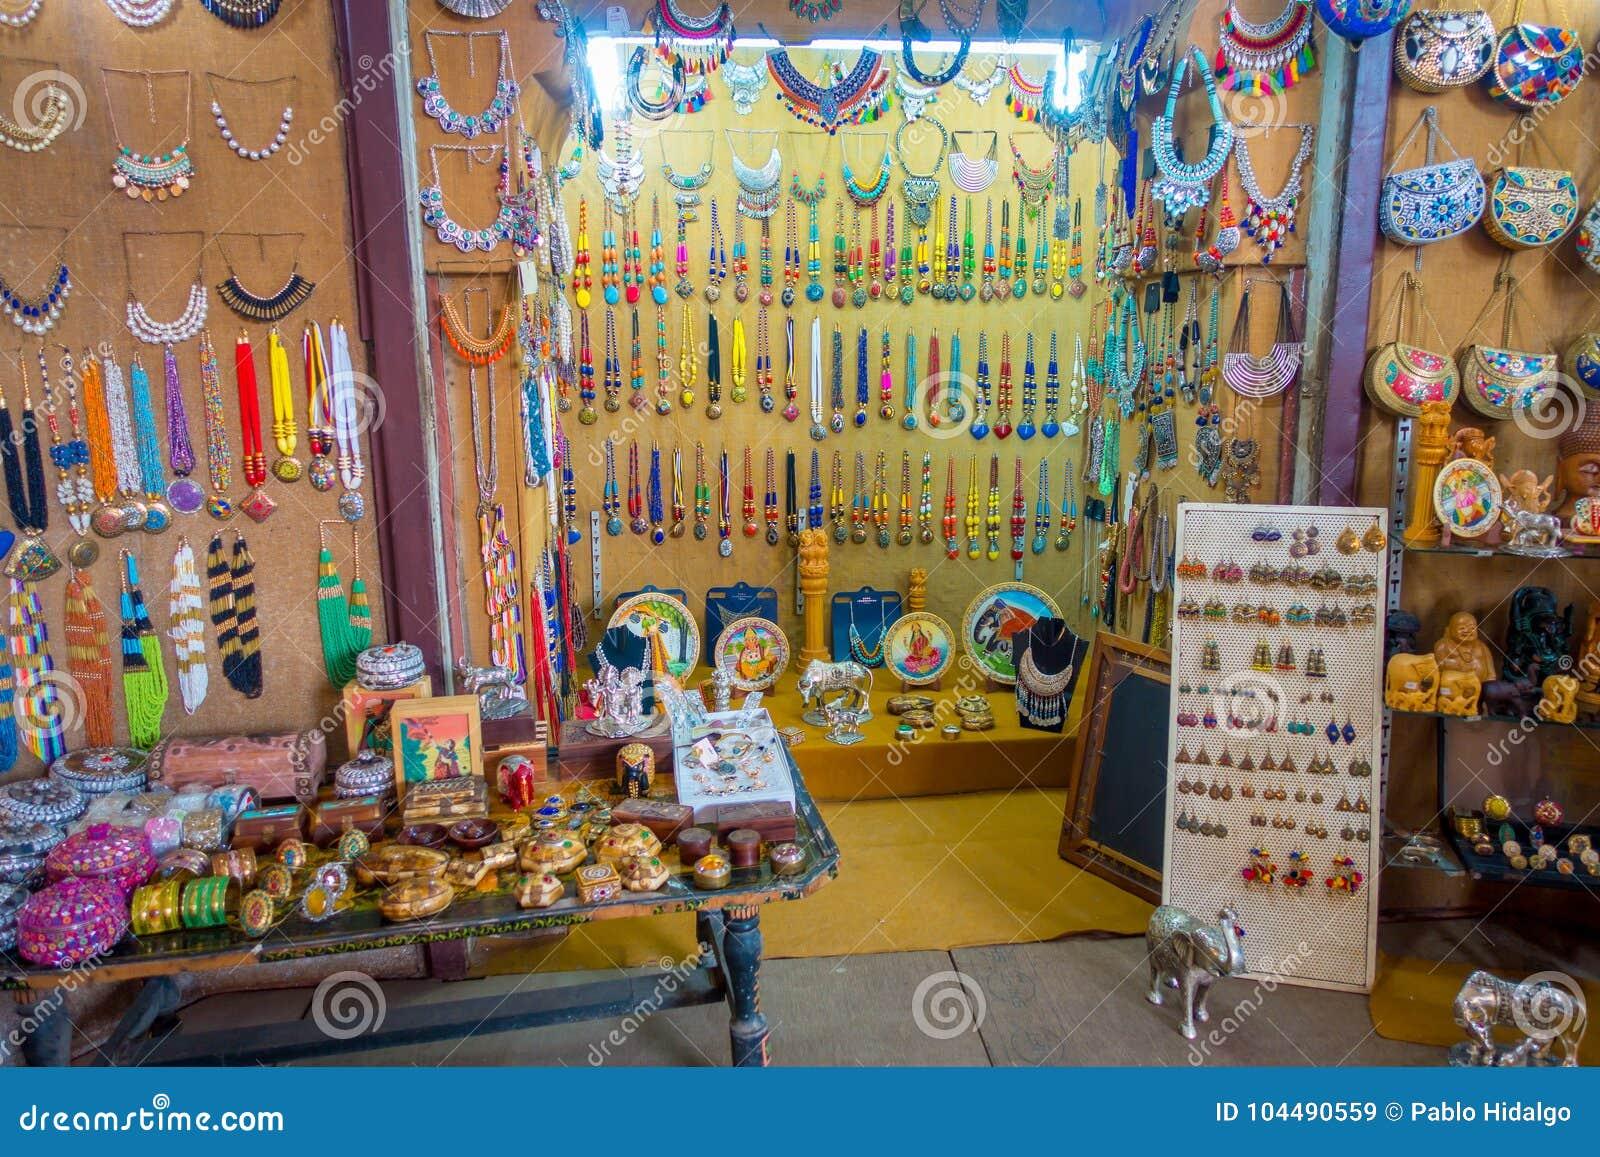 Delhi India September 25 2017 Close Up Of A Market With Handmade